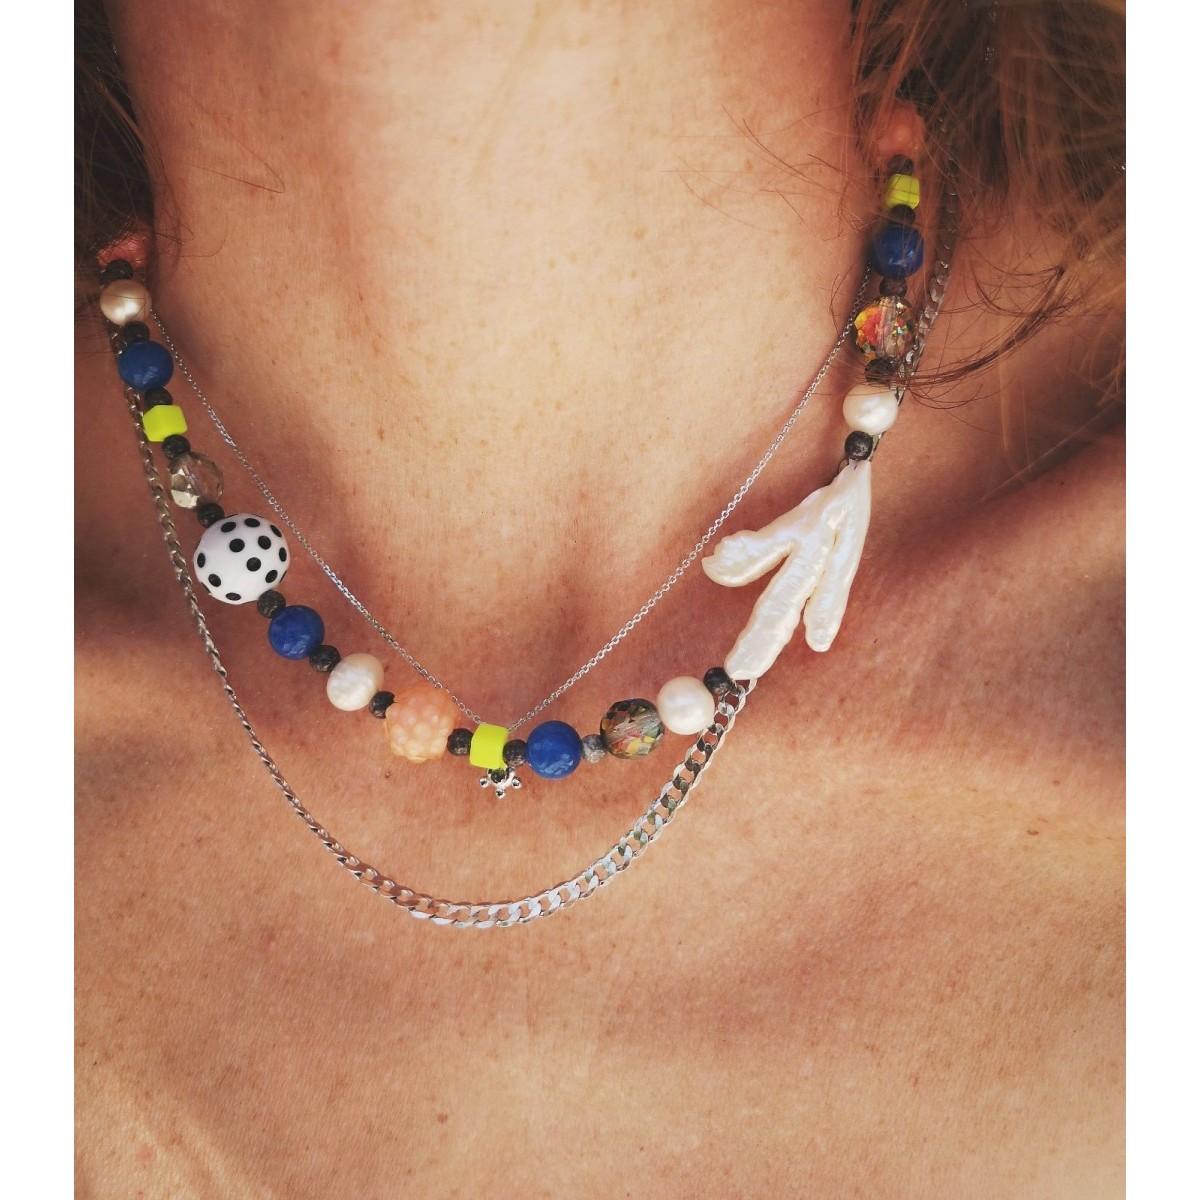 iloveblossom ITSY BITSY TEENIE WEENIE Halskette